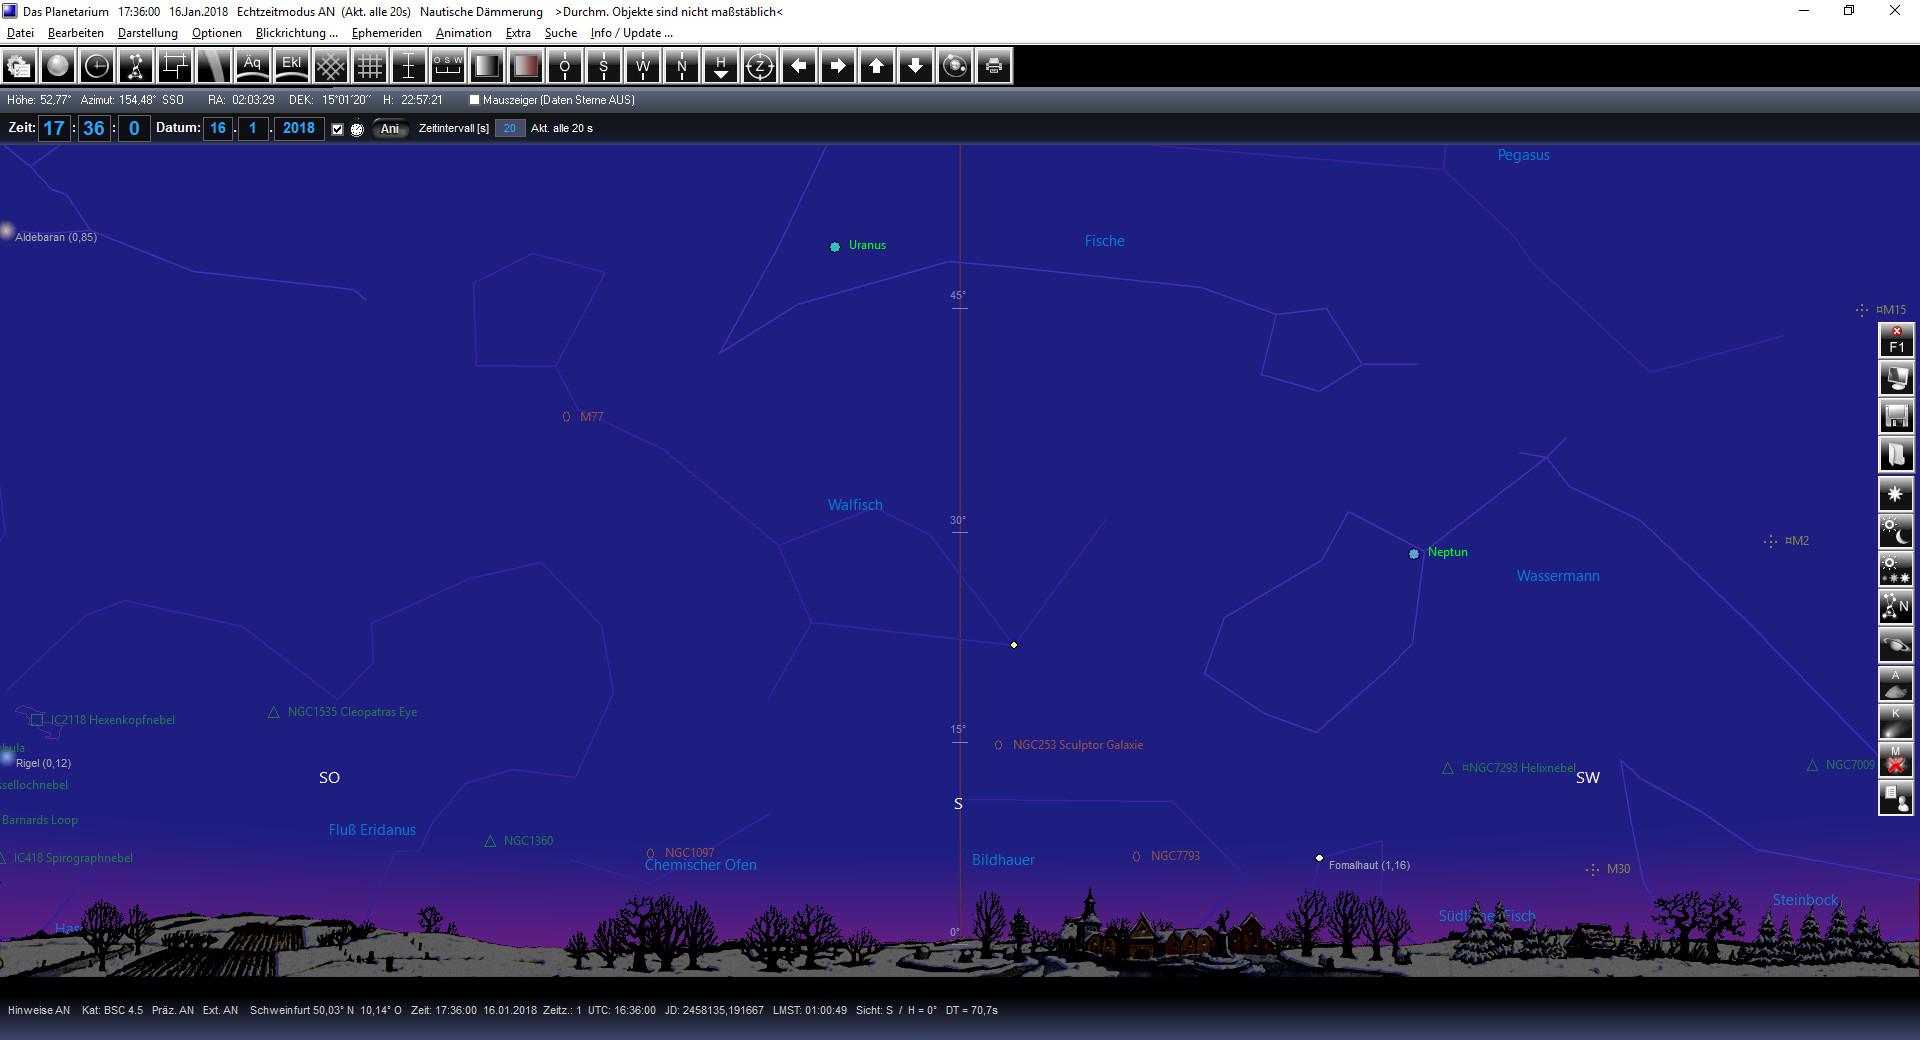 Screenshot 1 - Das Planetarium 1900-2100